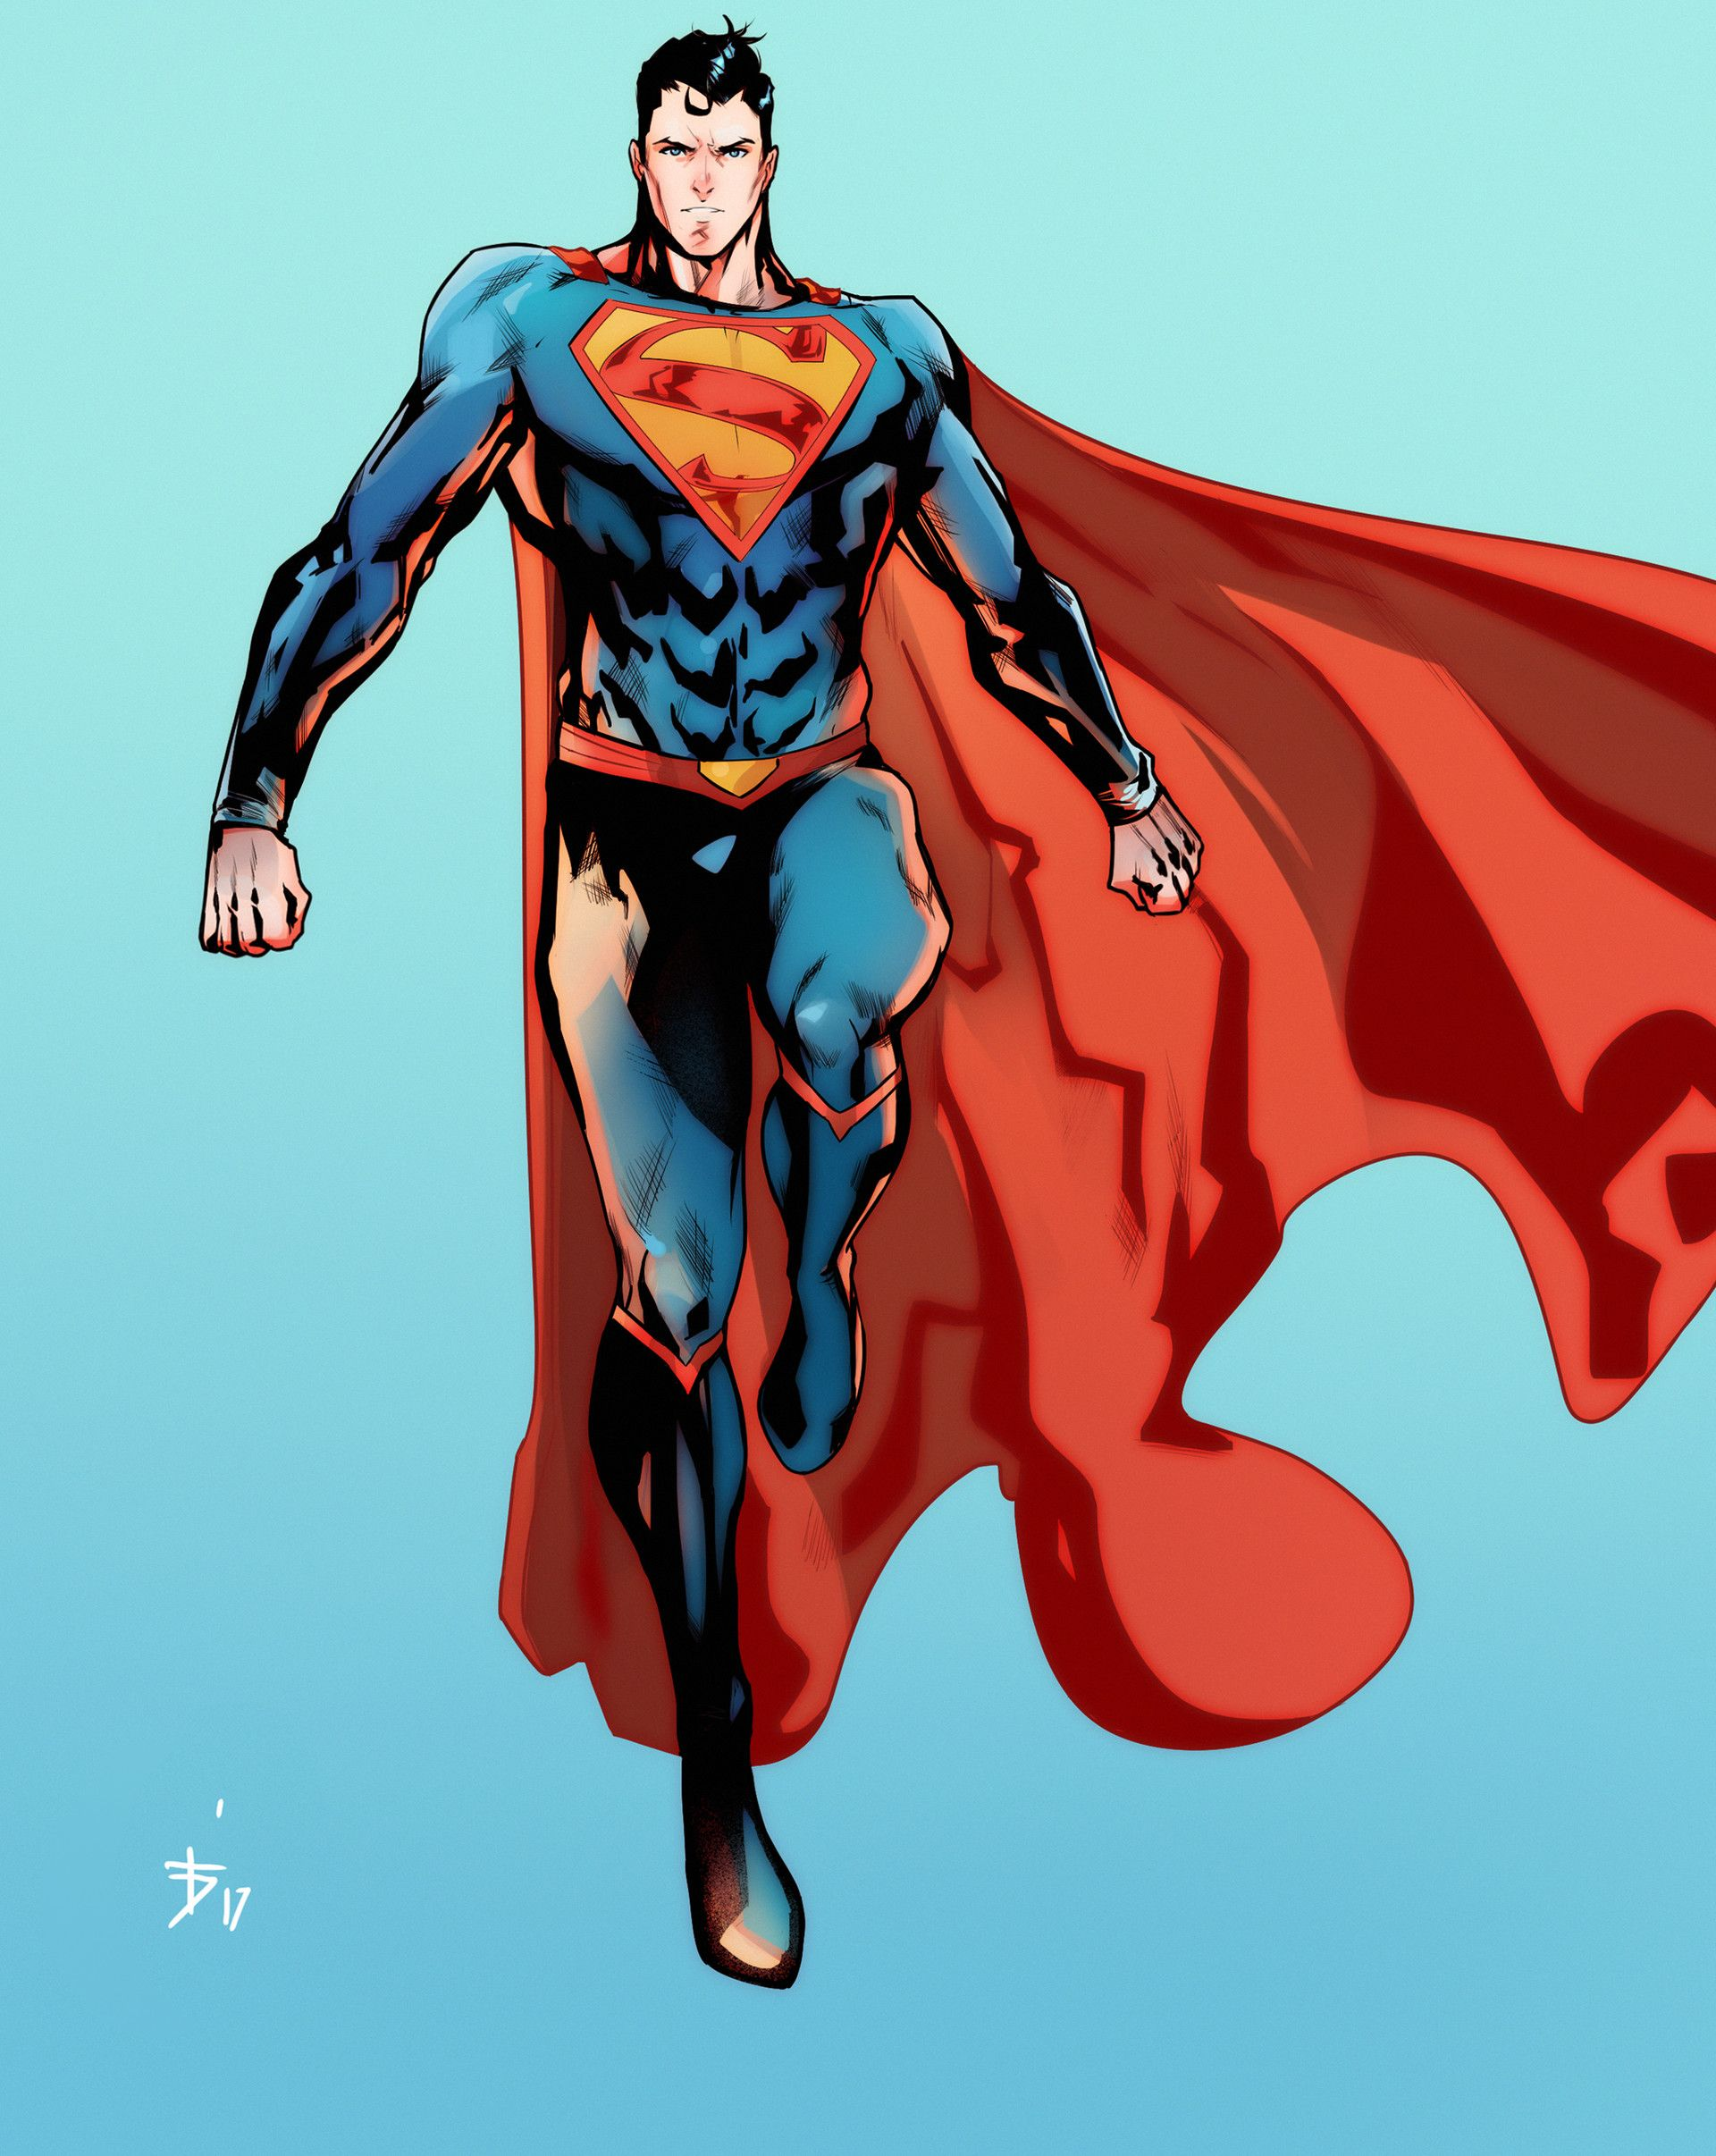 Картинки супермен из комиксов